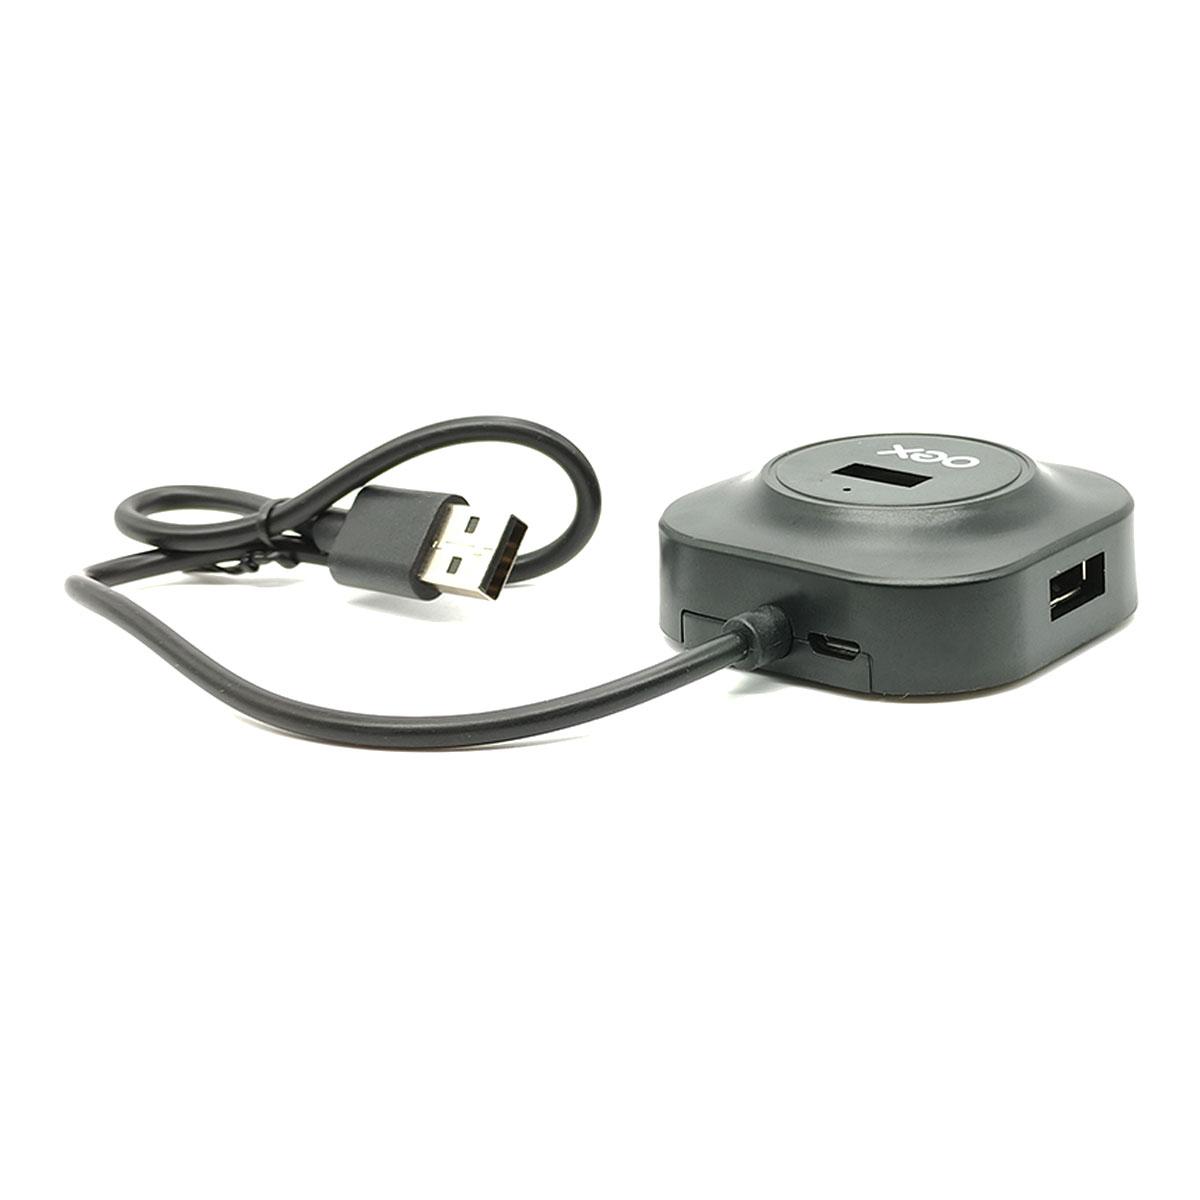 Hub USB 2.0 OEX HB101, 4 Portas